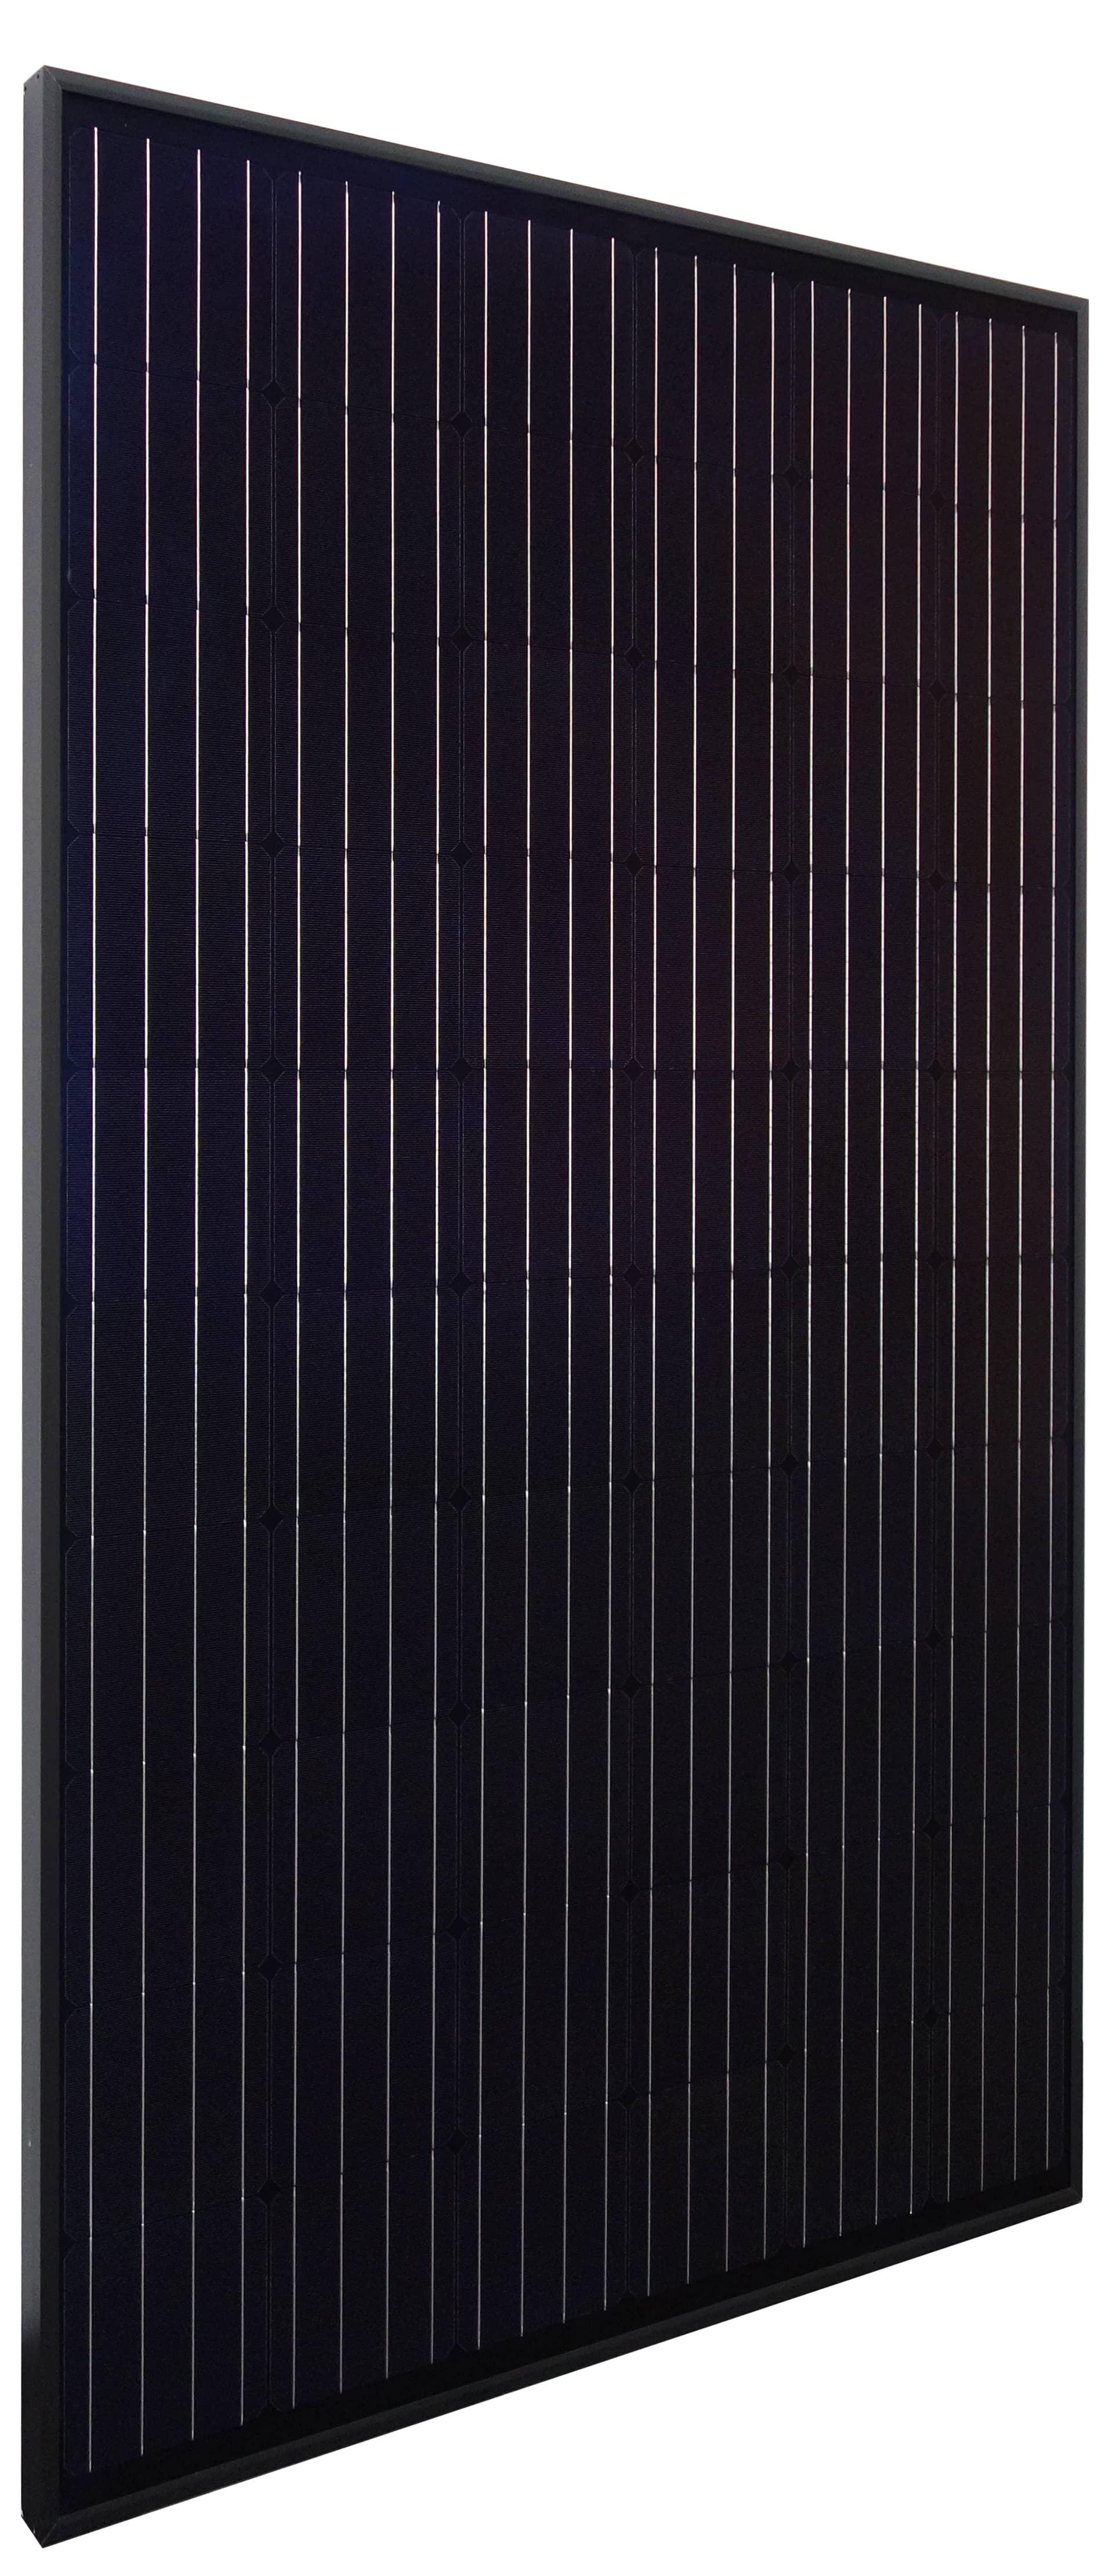 astronergy Astronergy Enters Monocrystalline Solar Module Market